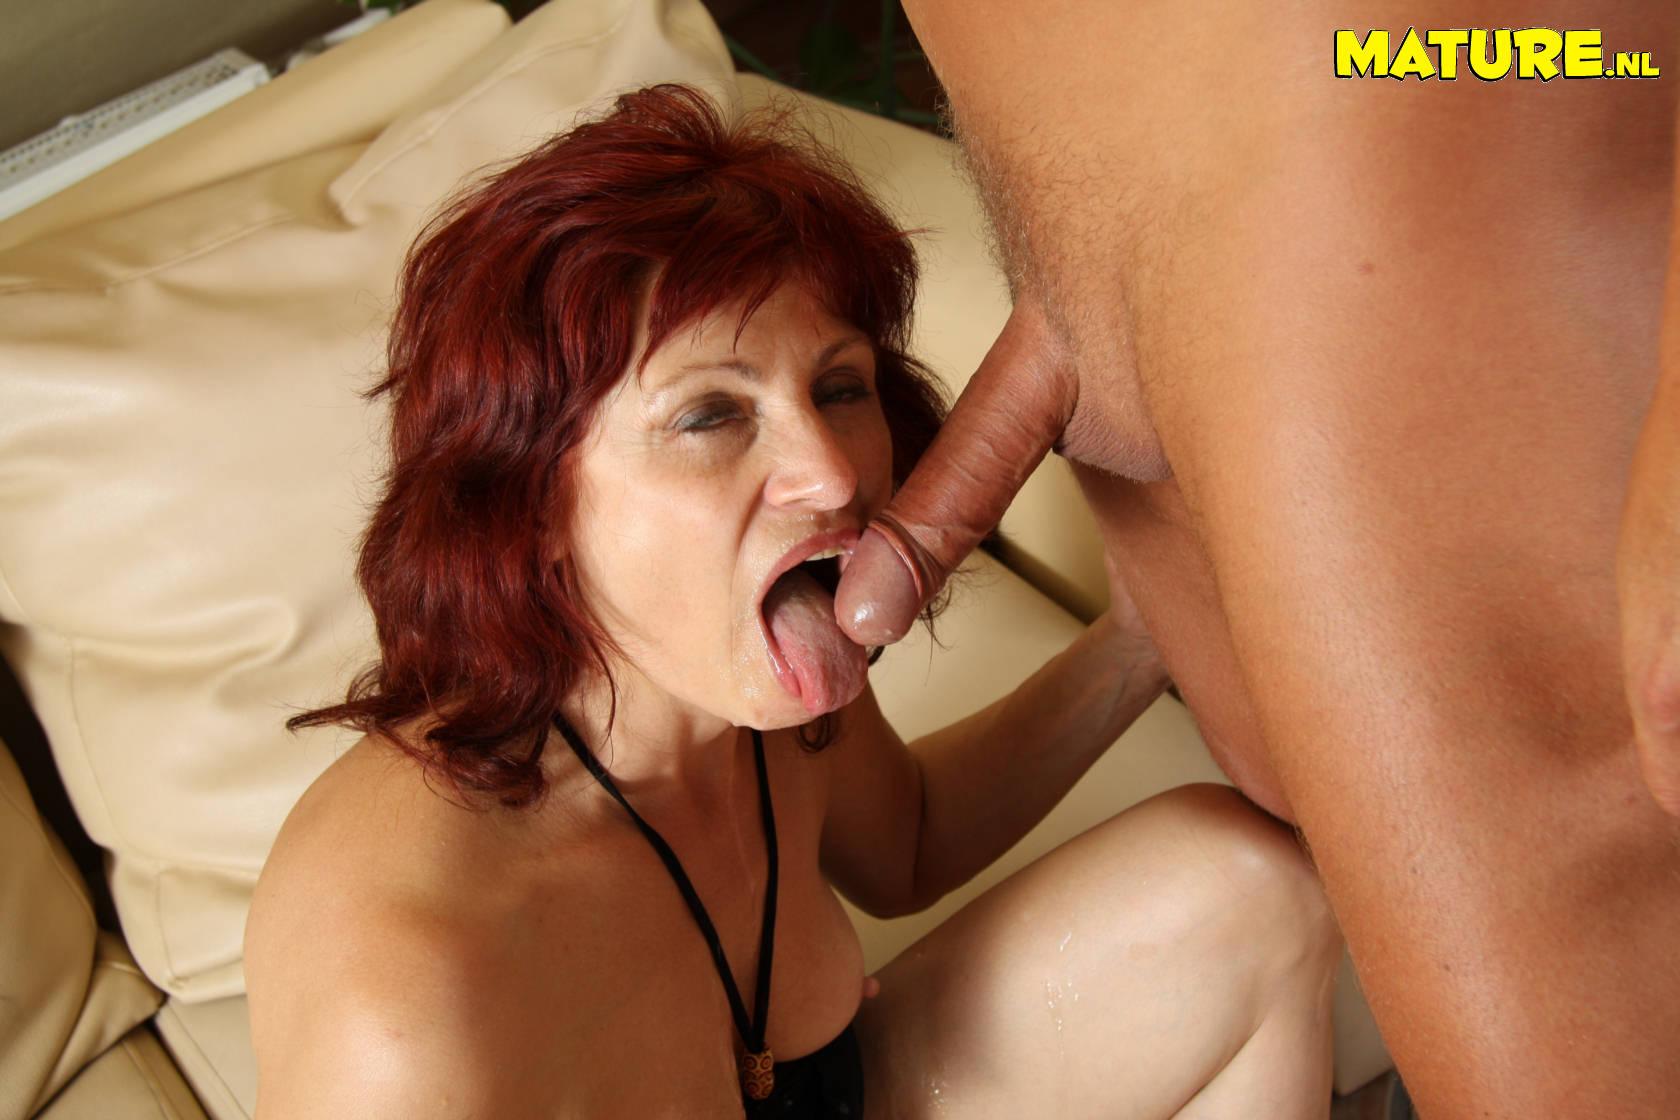 milf cock sucking redhead Hot